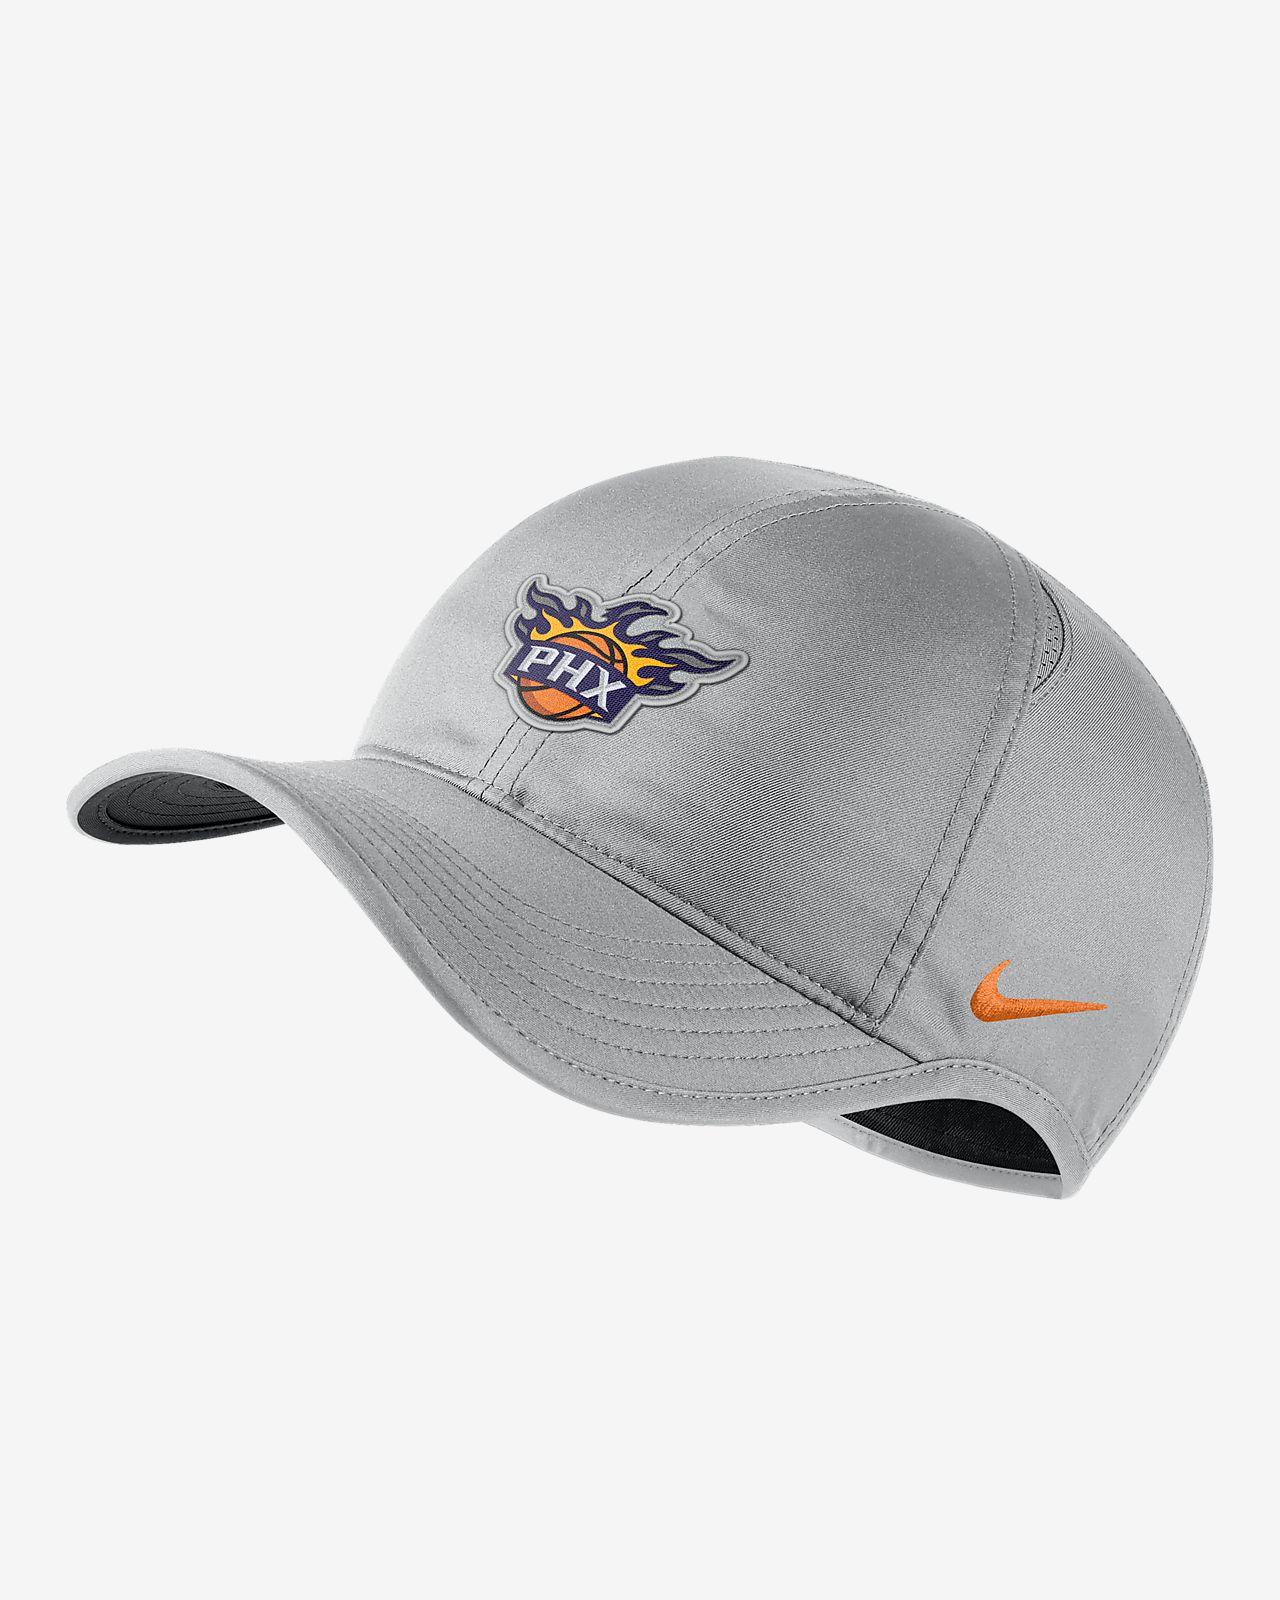 b8ec8fca3b81 Phoenix Suns Nike AeroBill Featherlight NBA Hat. Nike.com